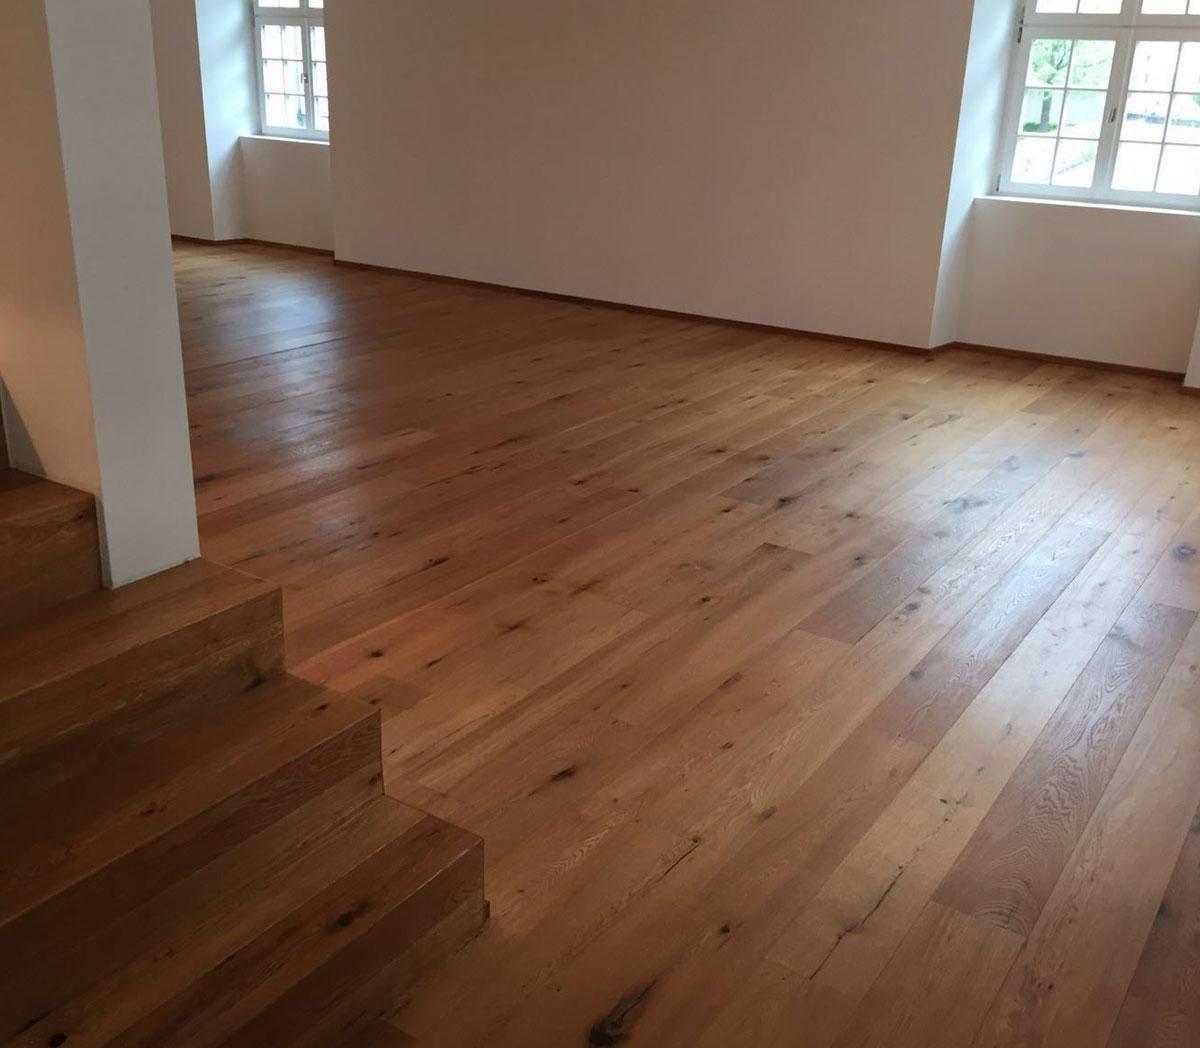 Pvc Parkett ferrer floors ag parkett in basel reinach bodenbeläge linoleum pvc